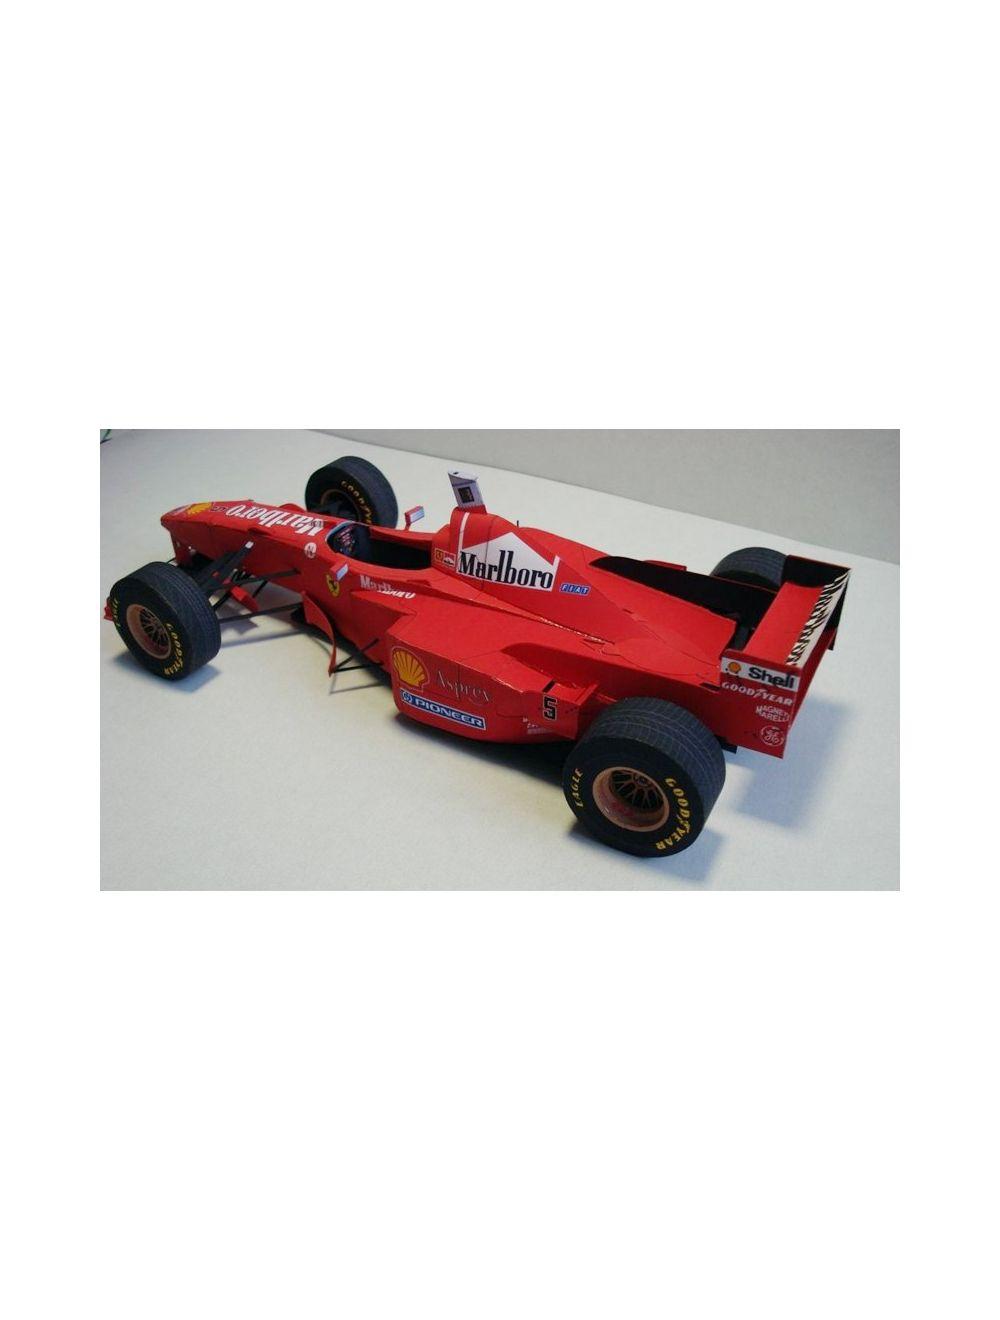 Ferrari F310b Fentens Kartonmodellbau